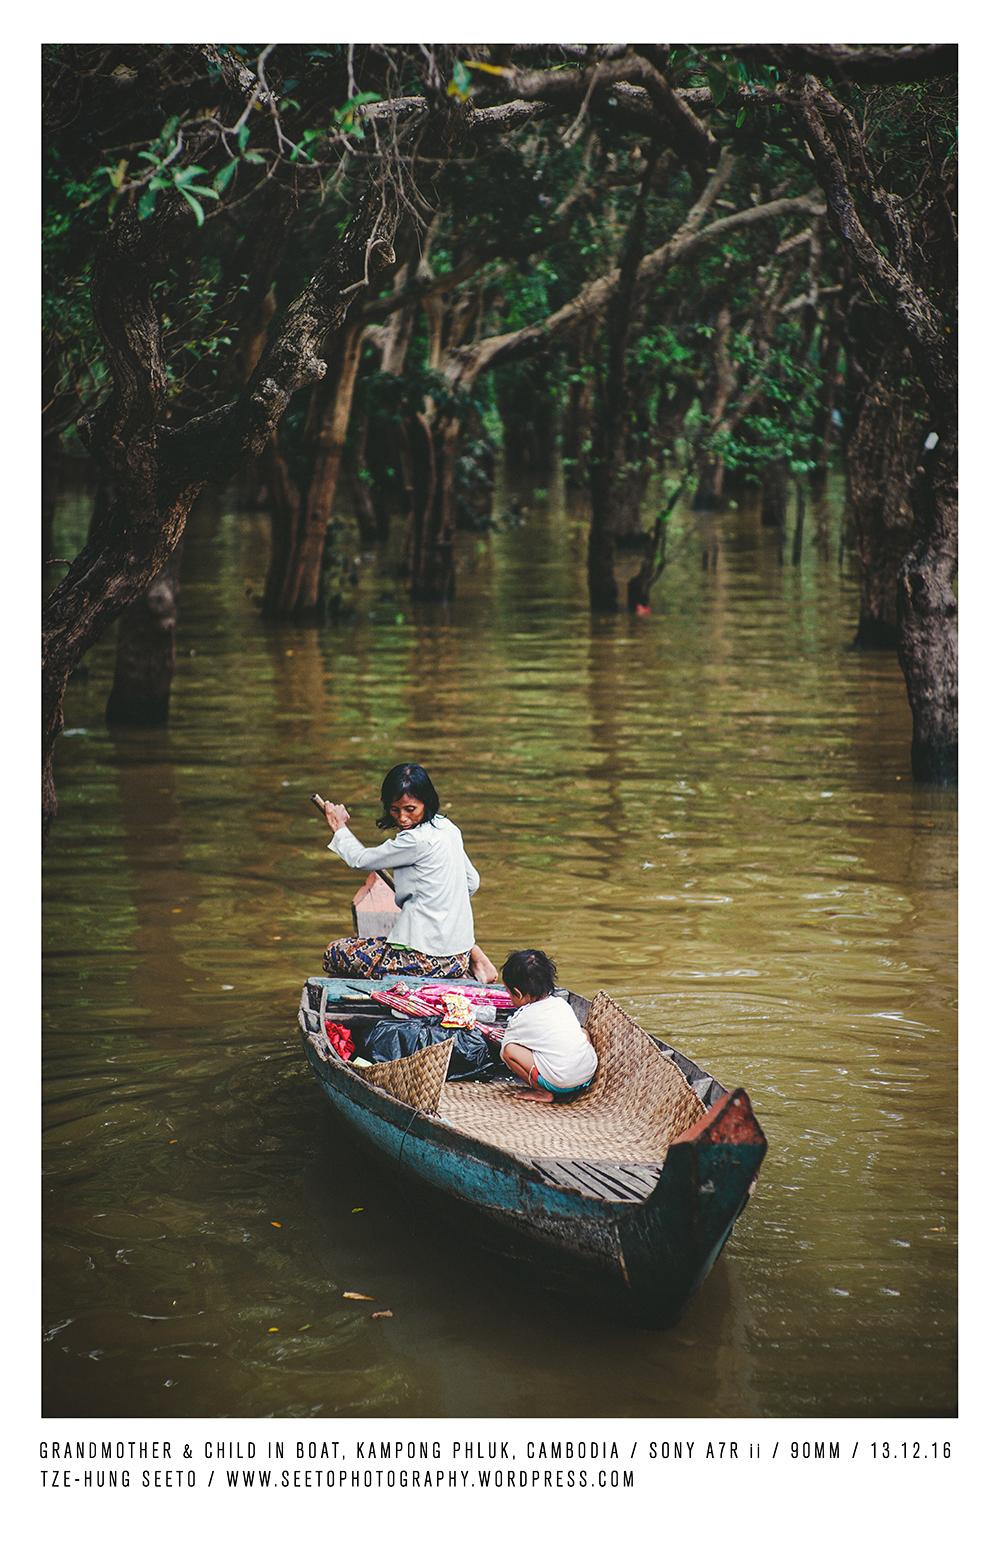 Cambodia, Kampong Phluk, Grandmother & child in Boat_CP.jpg